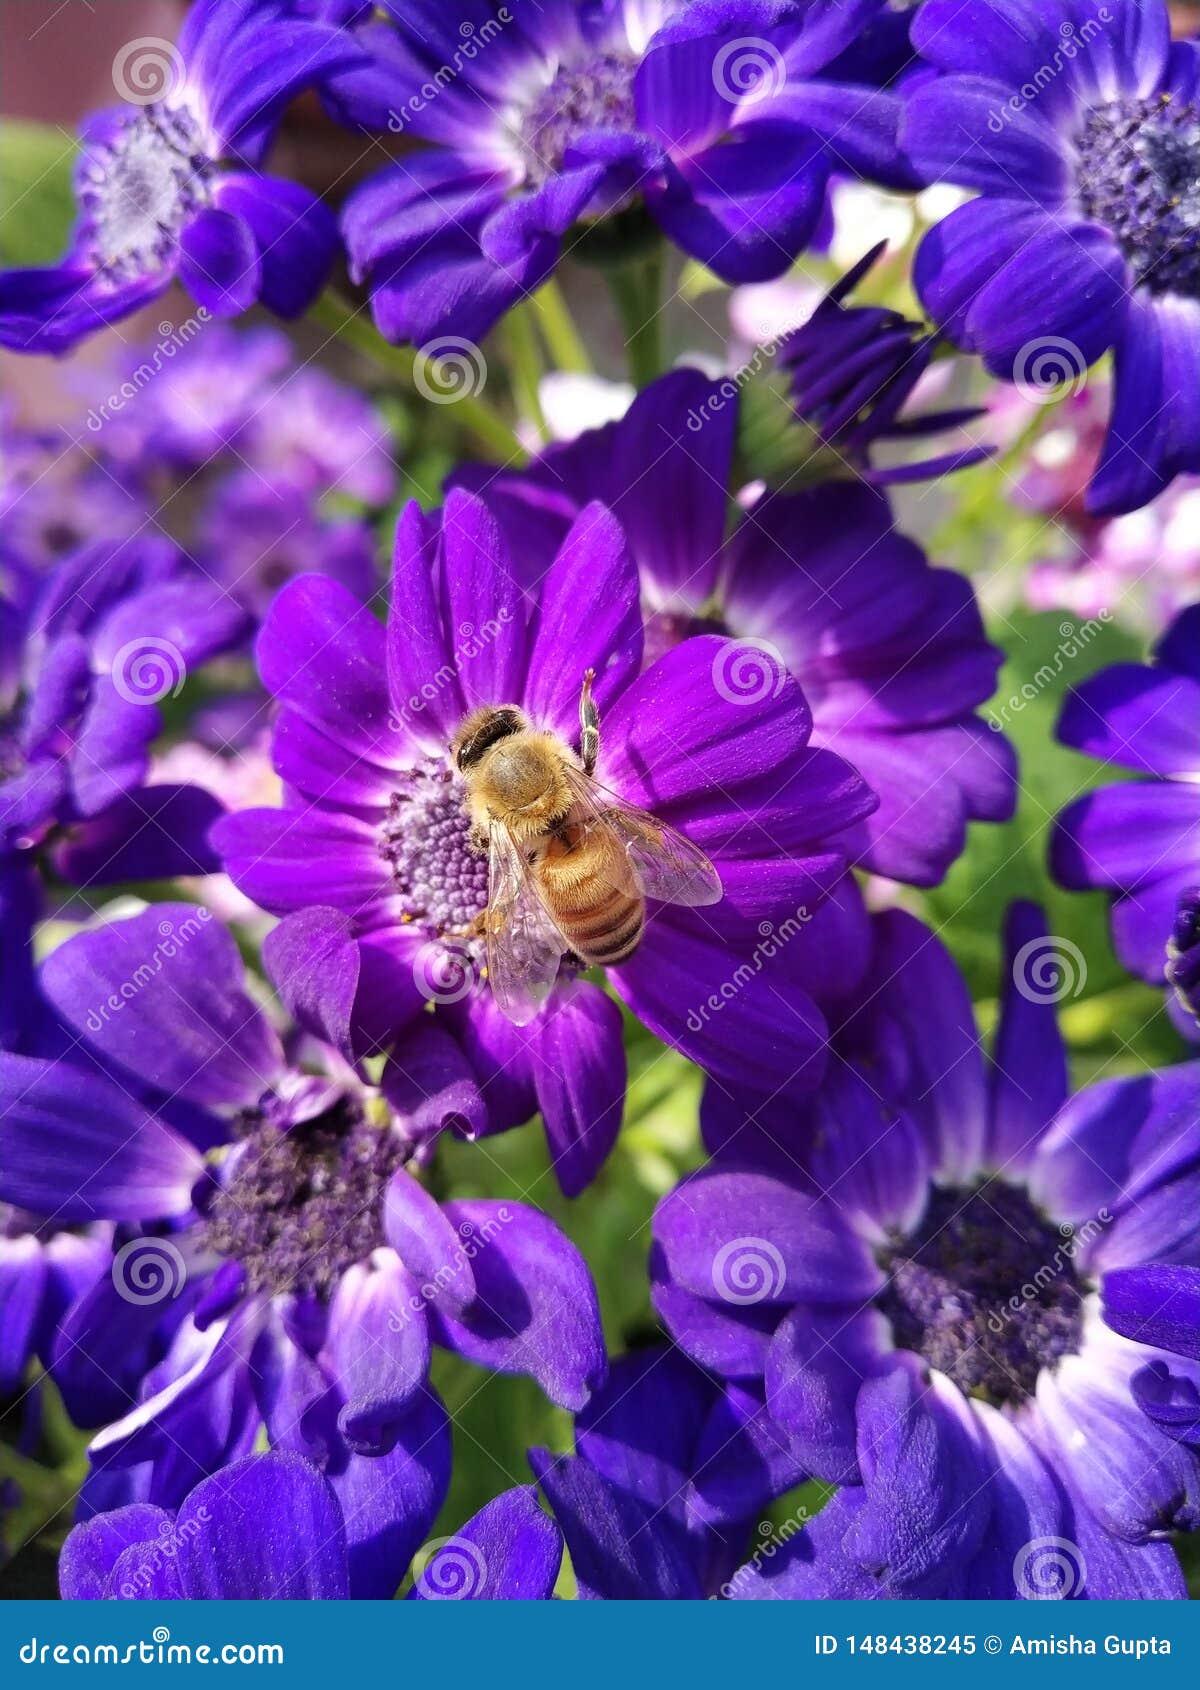 Цветене cineraria лета и свой нектар привлекают пчел